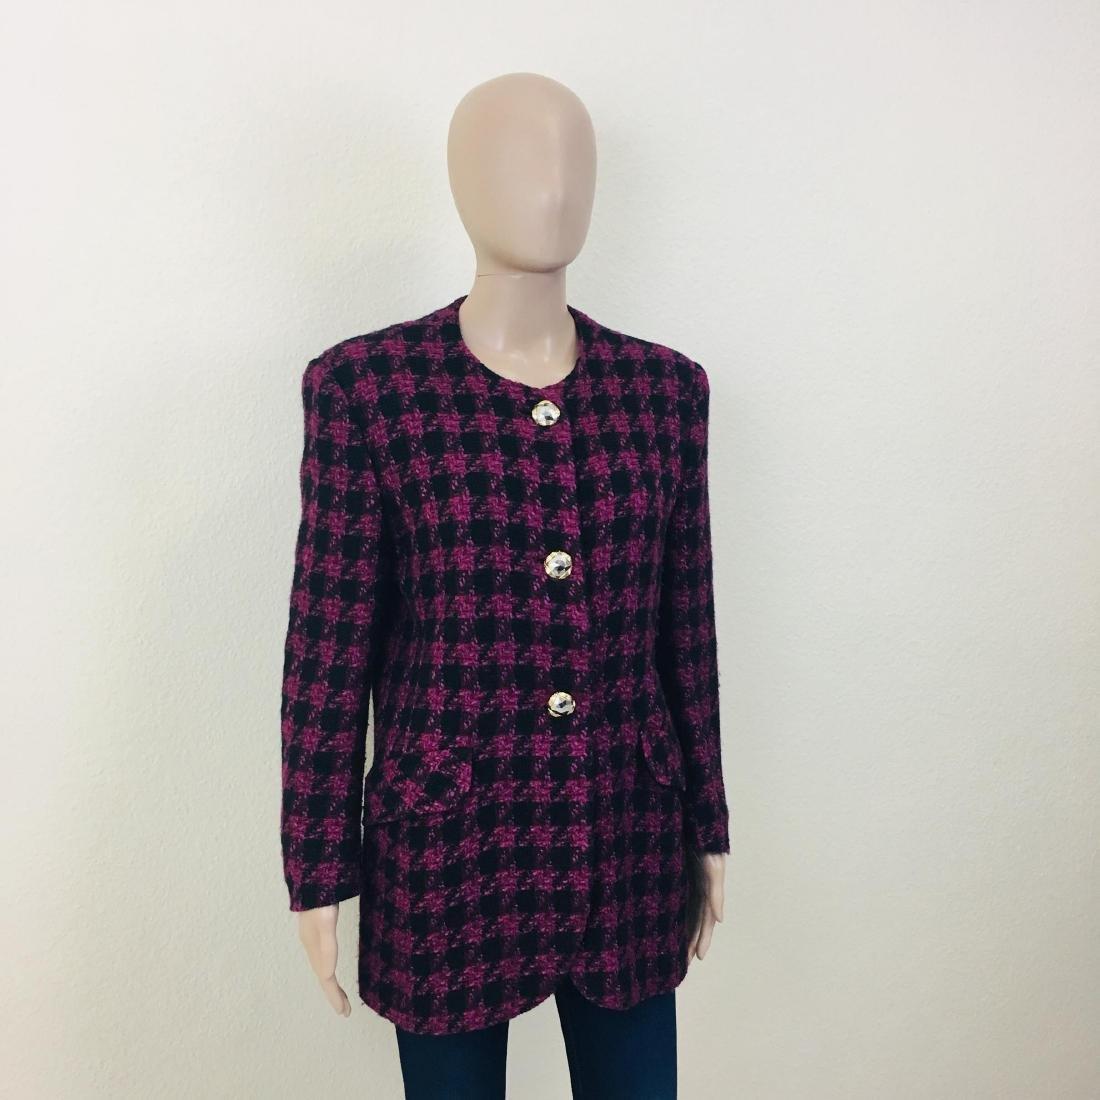 Vintage Women's Uknown Italian Designer Wool Blend - 3